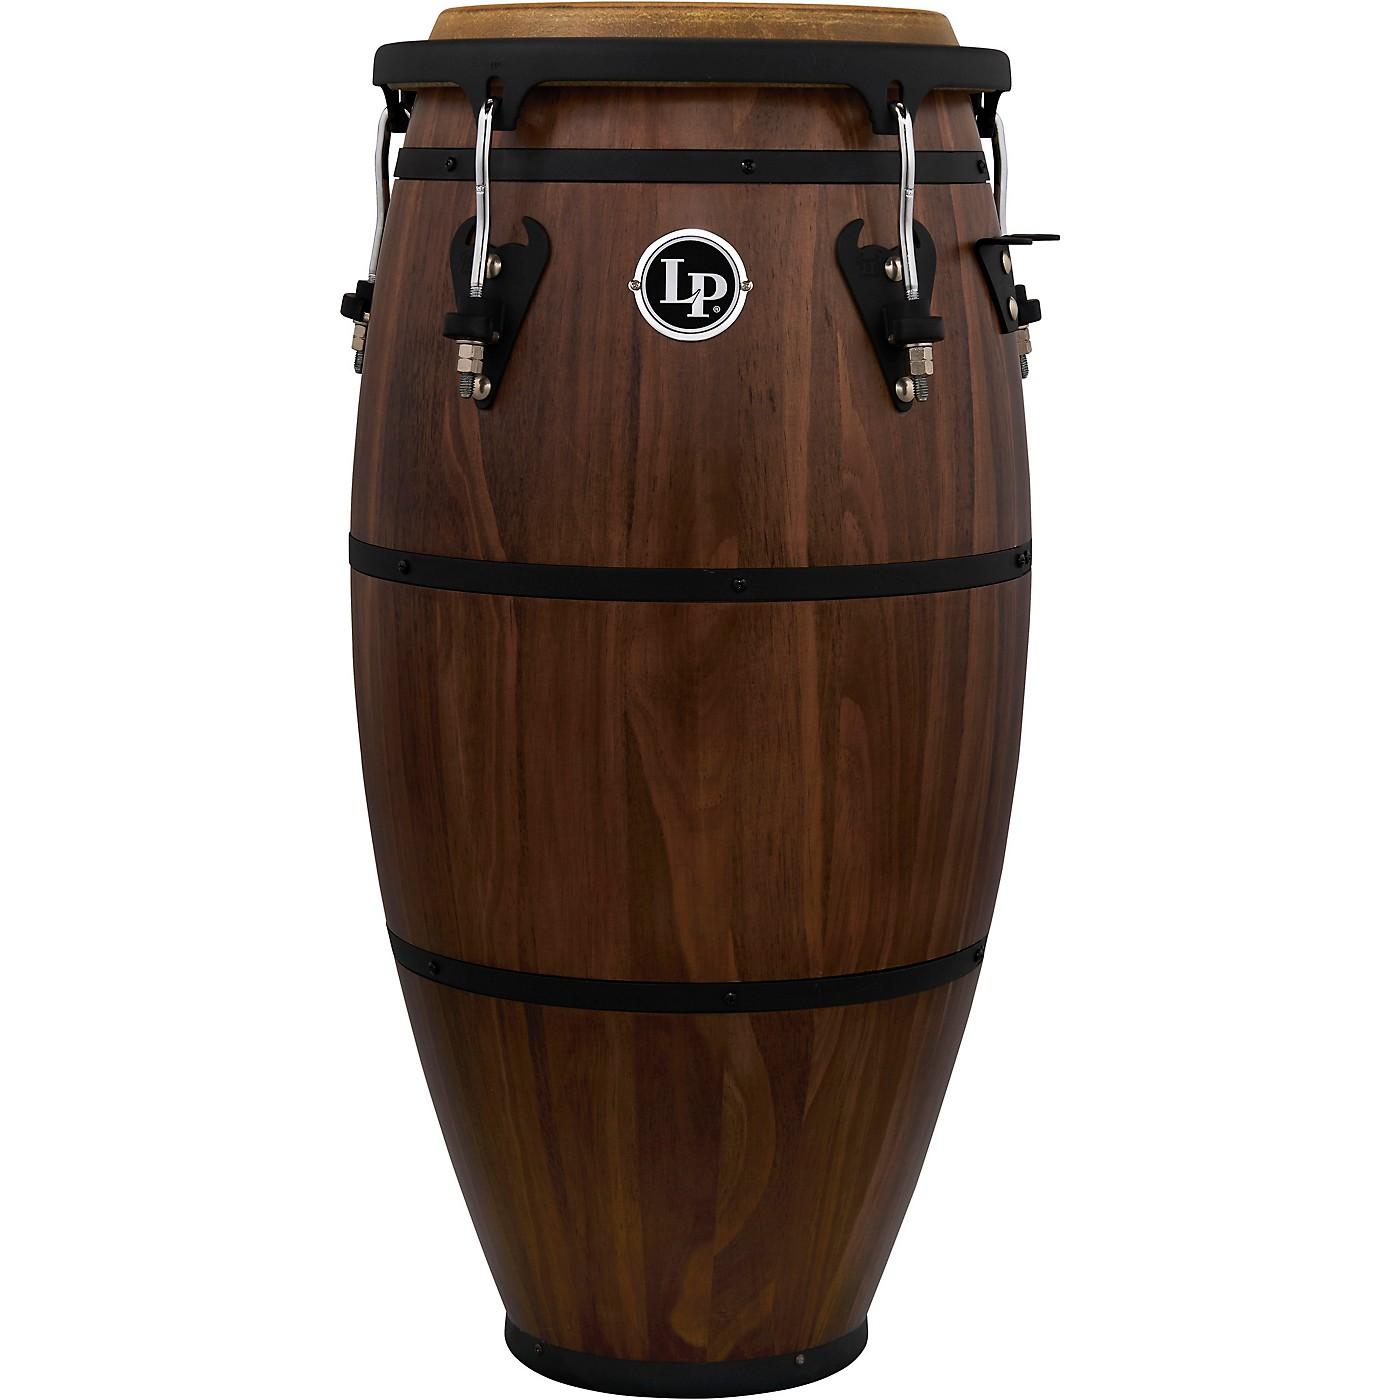 LP Matador Whiskey Barrel Conga, with Black Hardware thumbnail